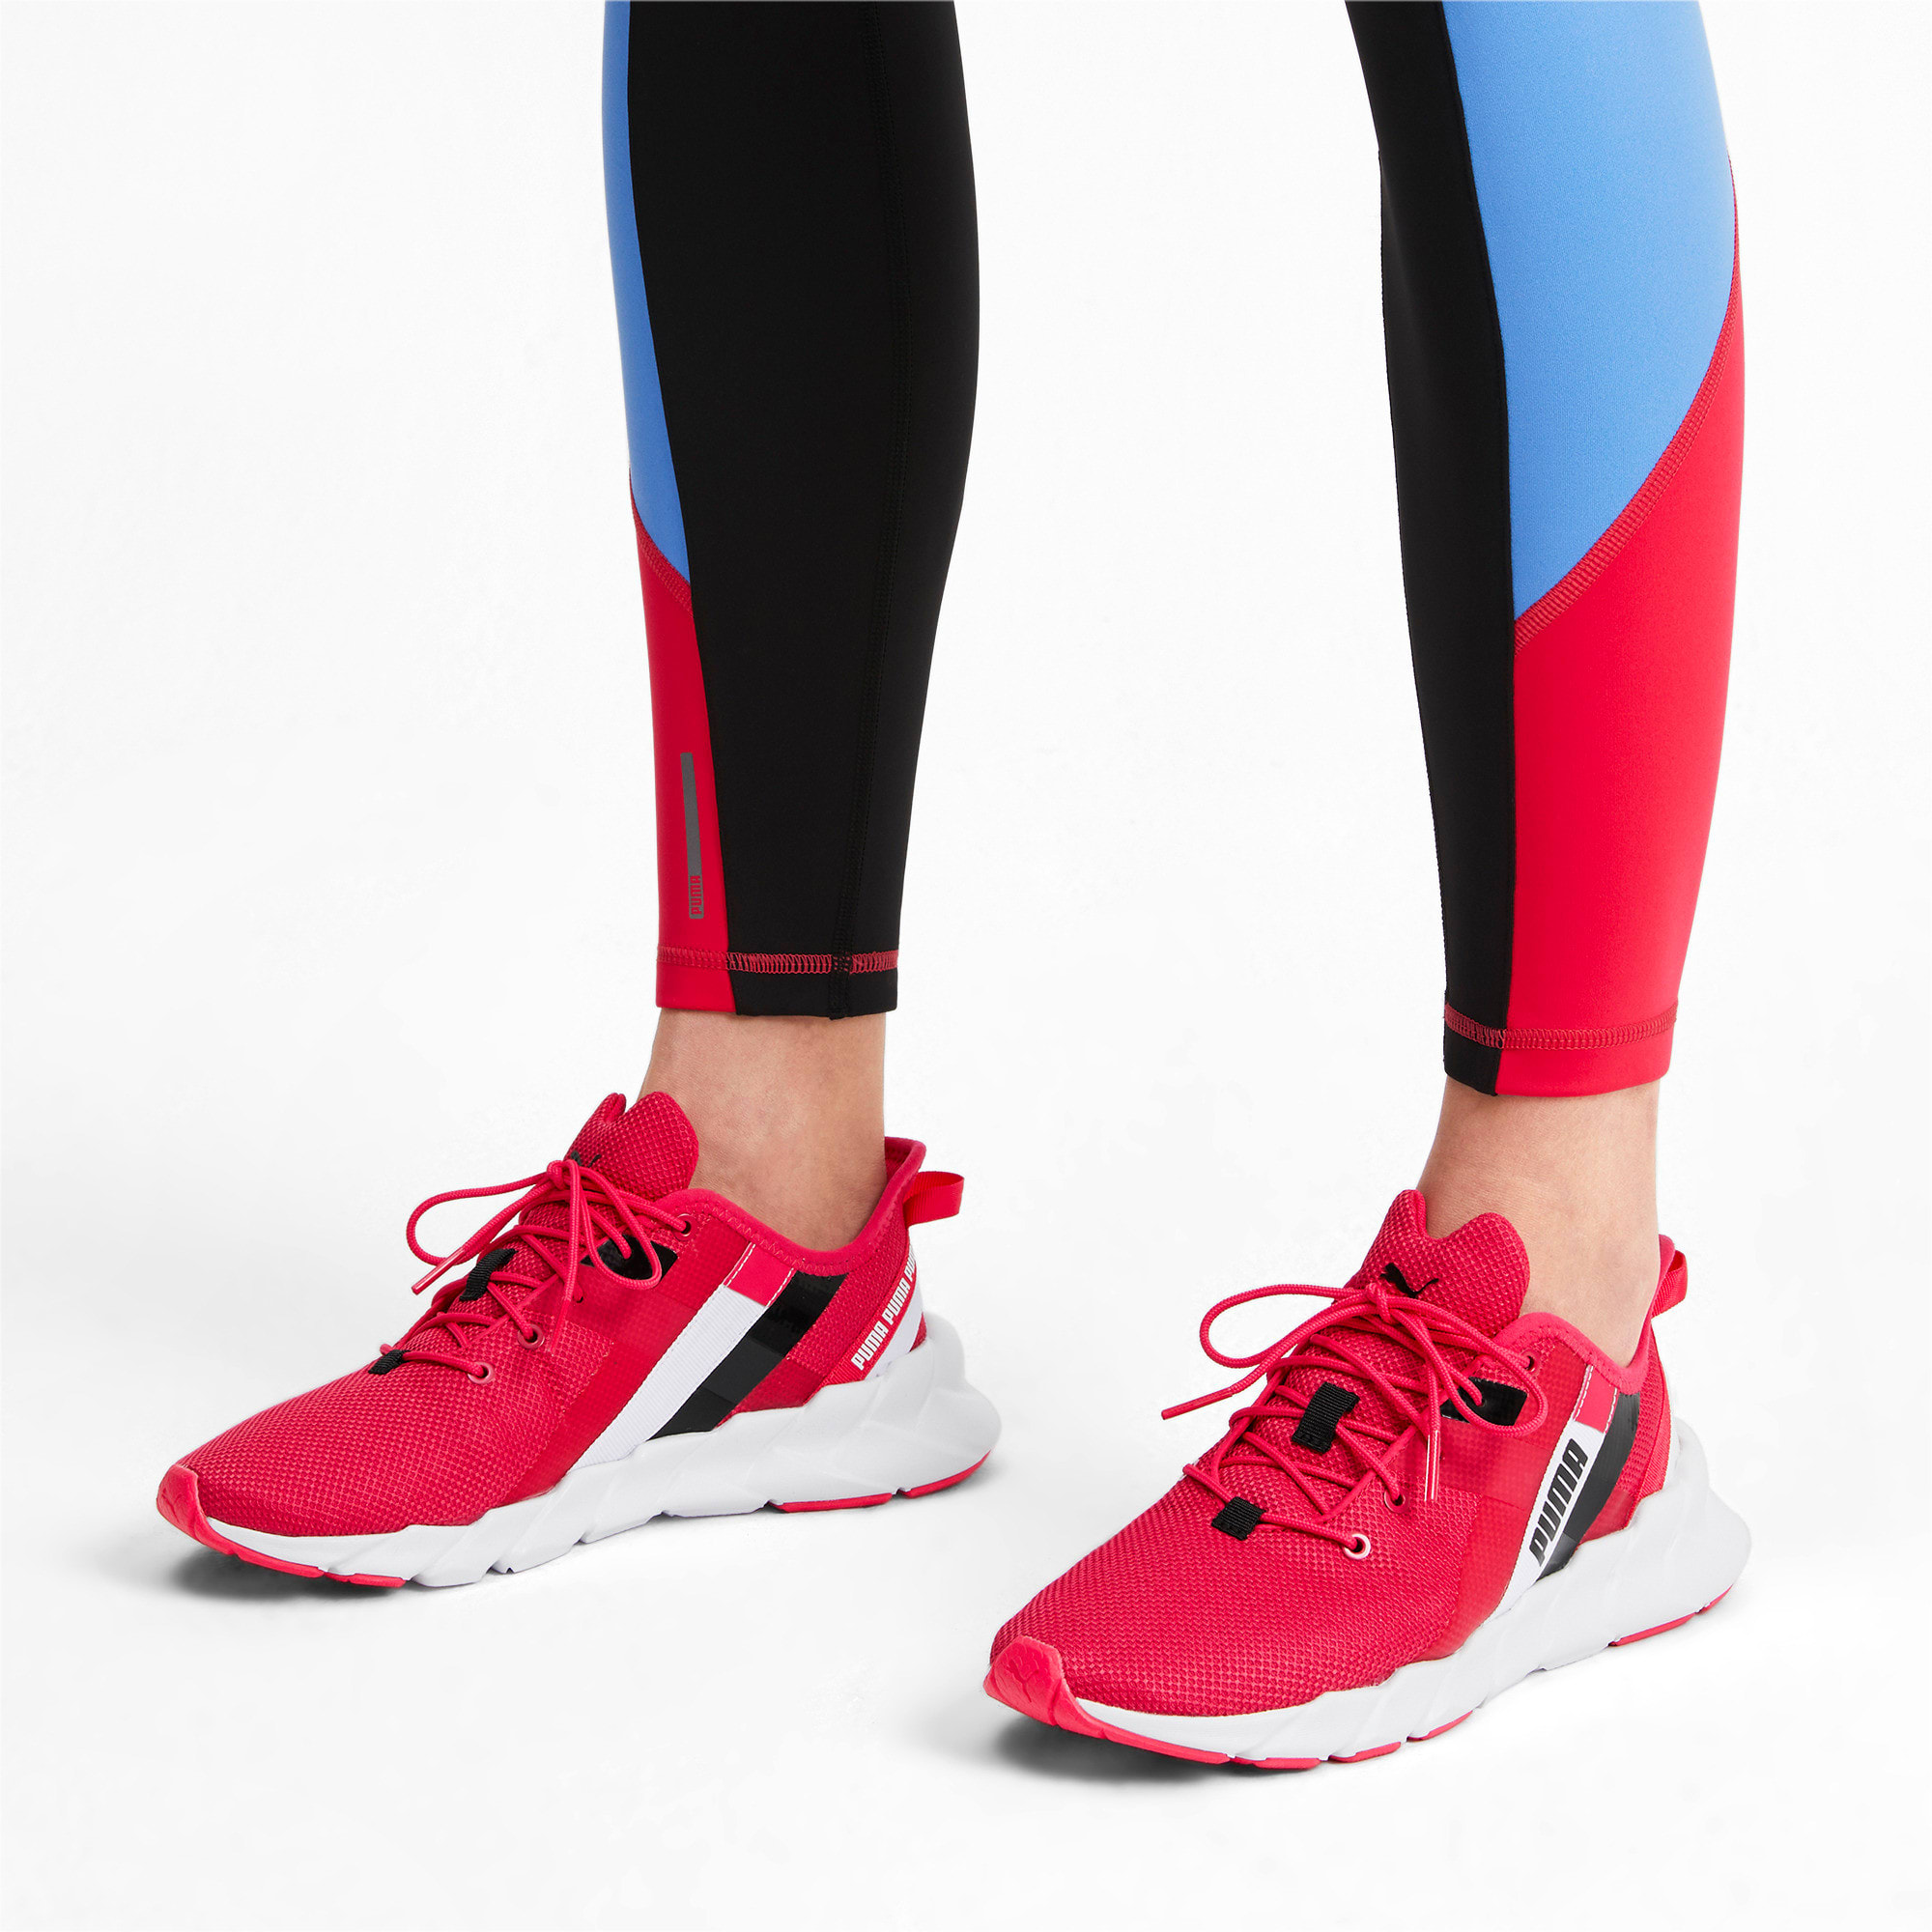 Thumbnail 2 of Weave XT Shift Women's Training Shoes, Nrgy Rose-Puma White, medium